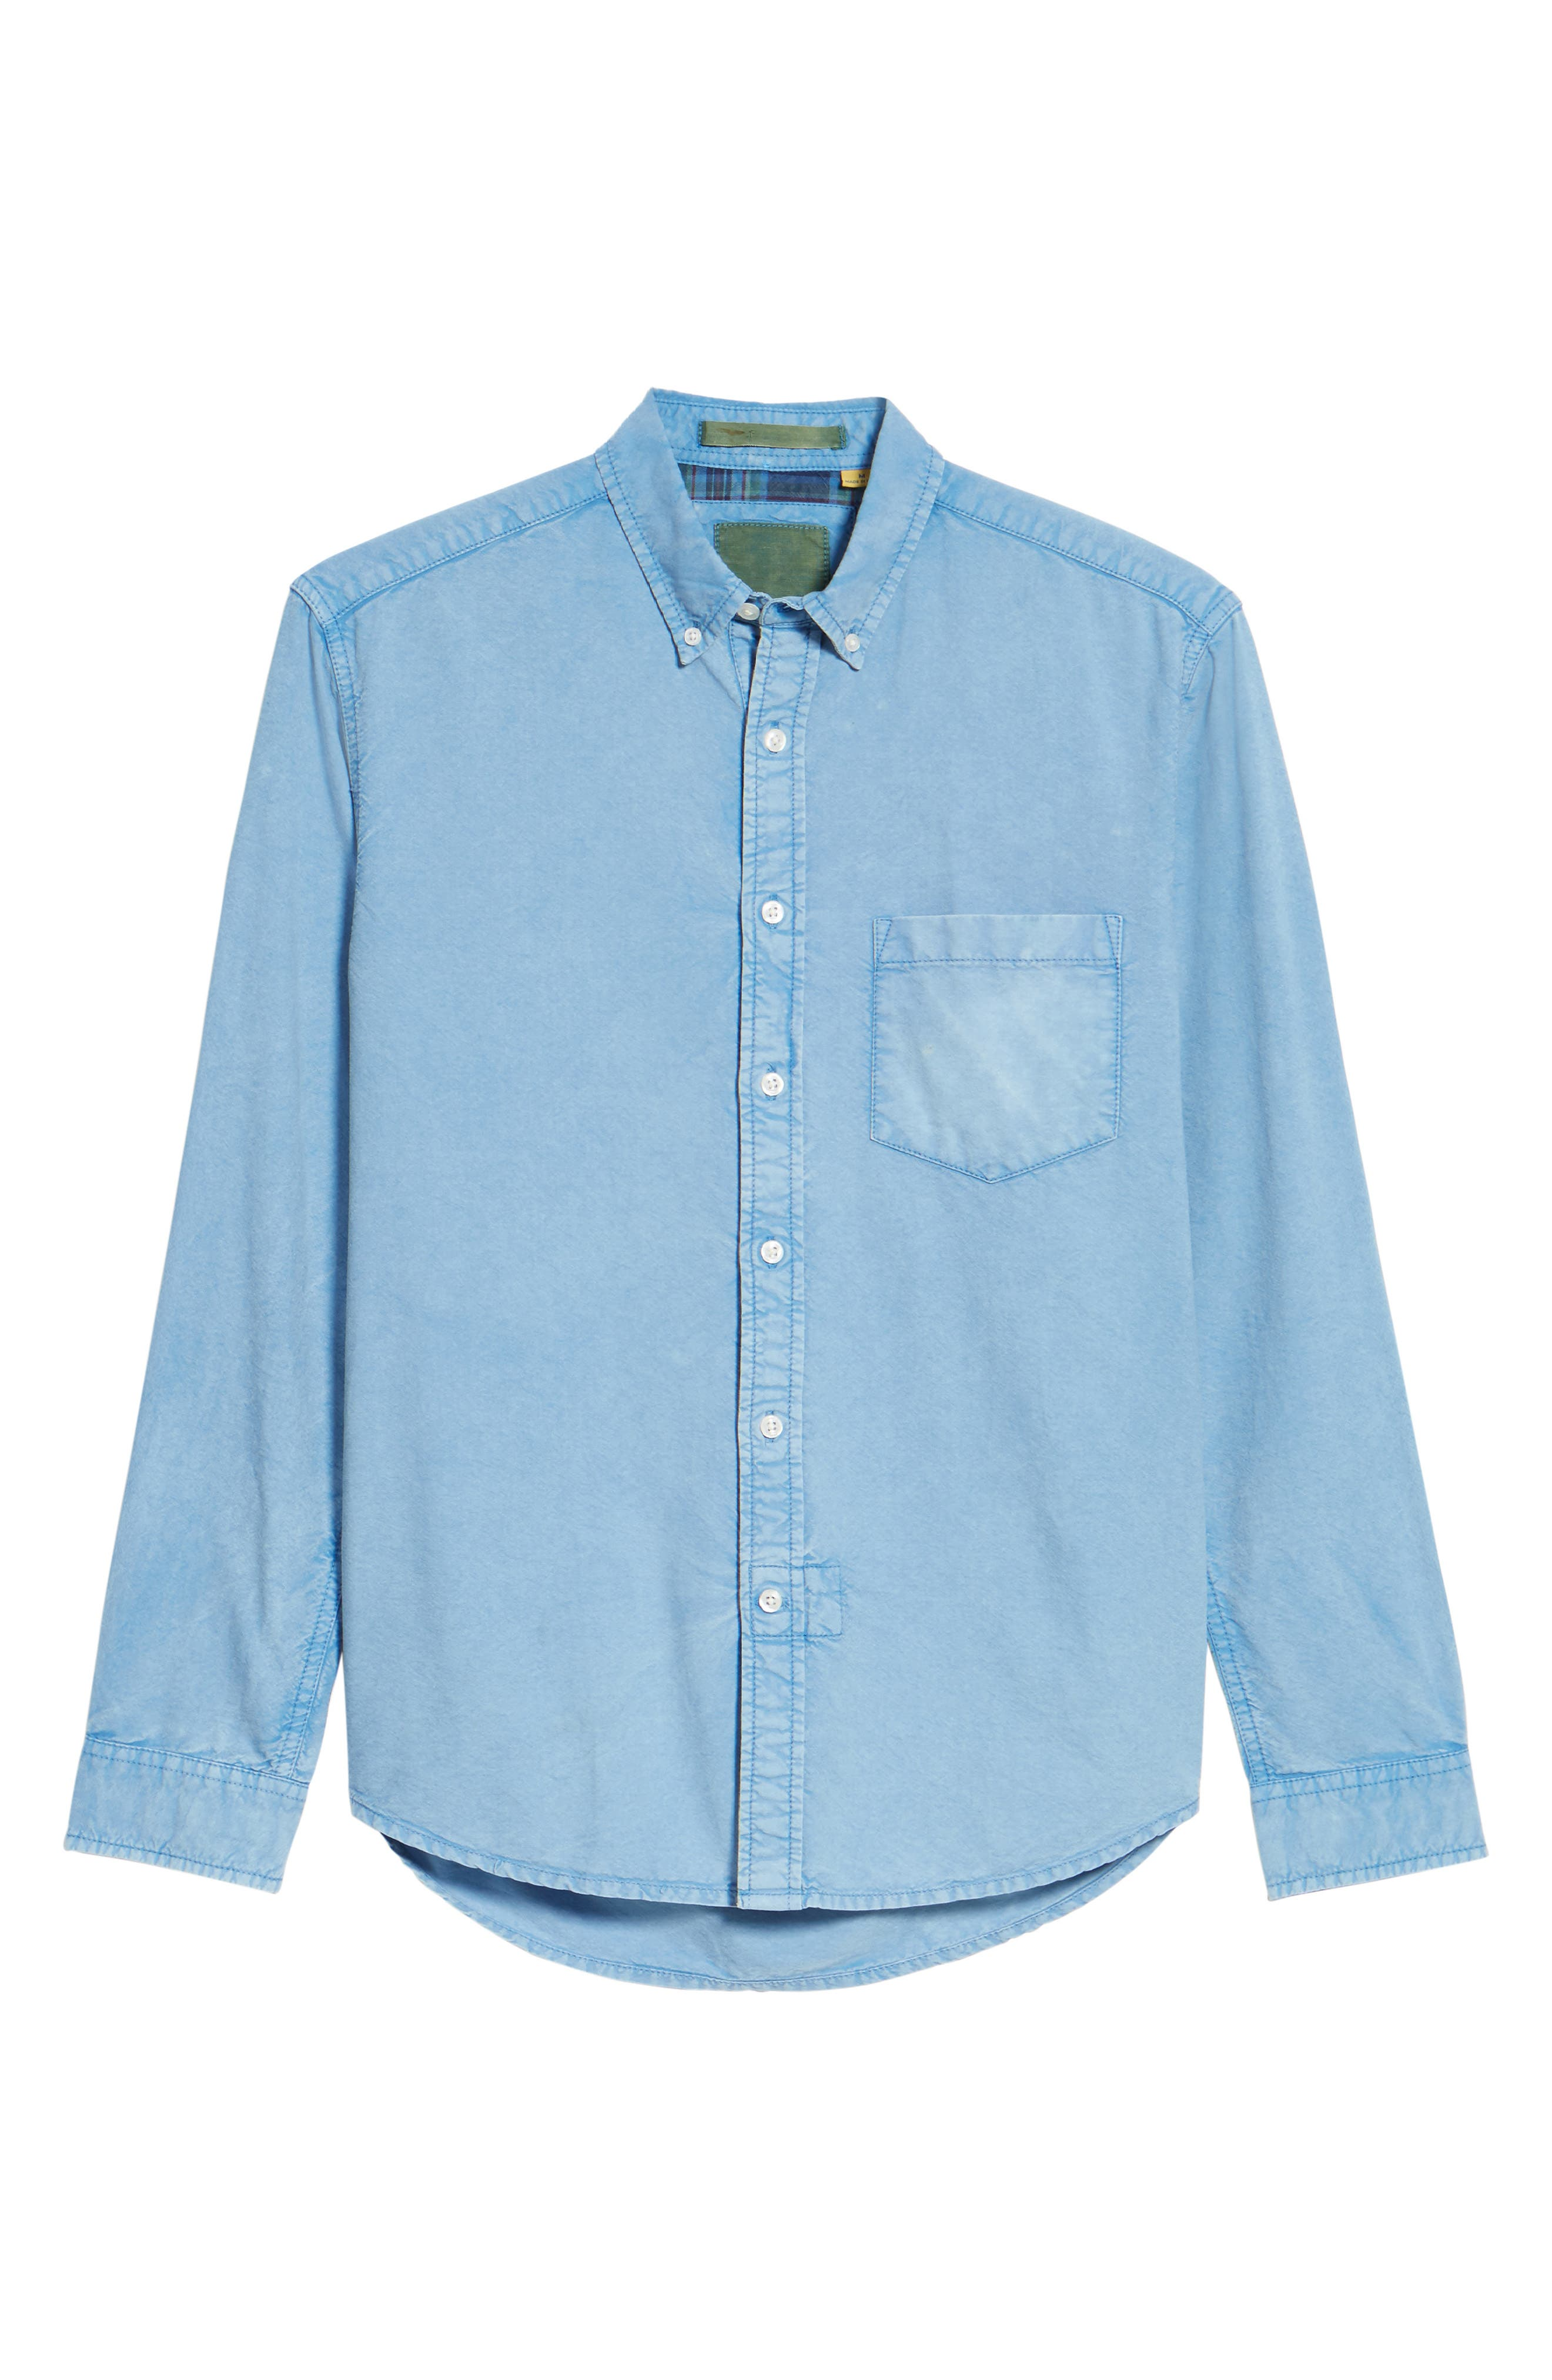 Regular Fit Oxford Sport Shirt,                             Alternate thumbnail 6, color,                             460